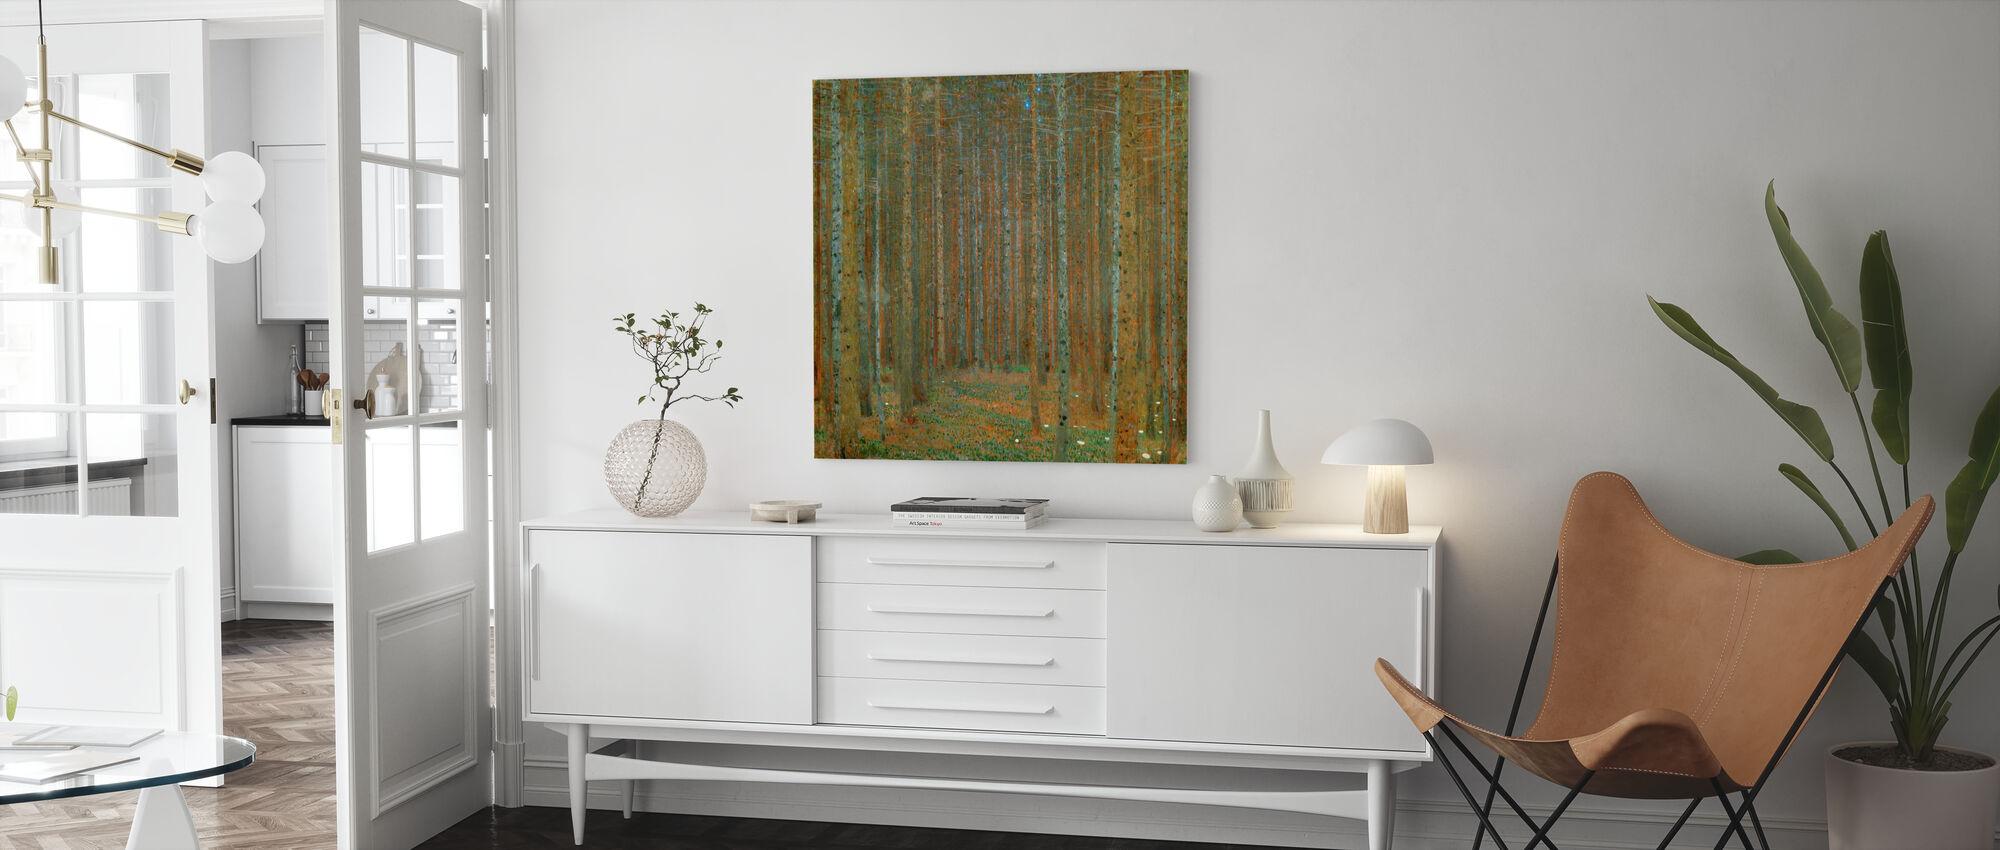 Klimt, Gustav - Fir Forest I - Lerretsbilde - Stue